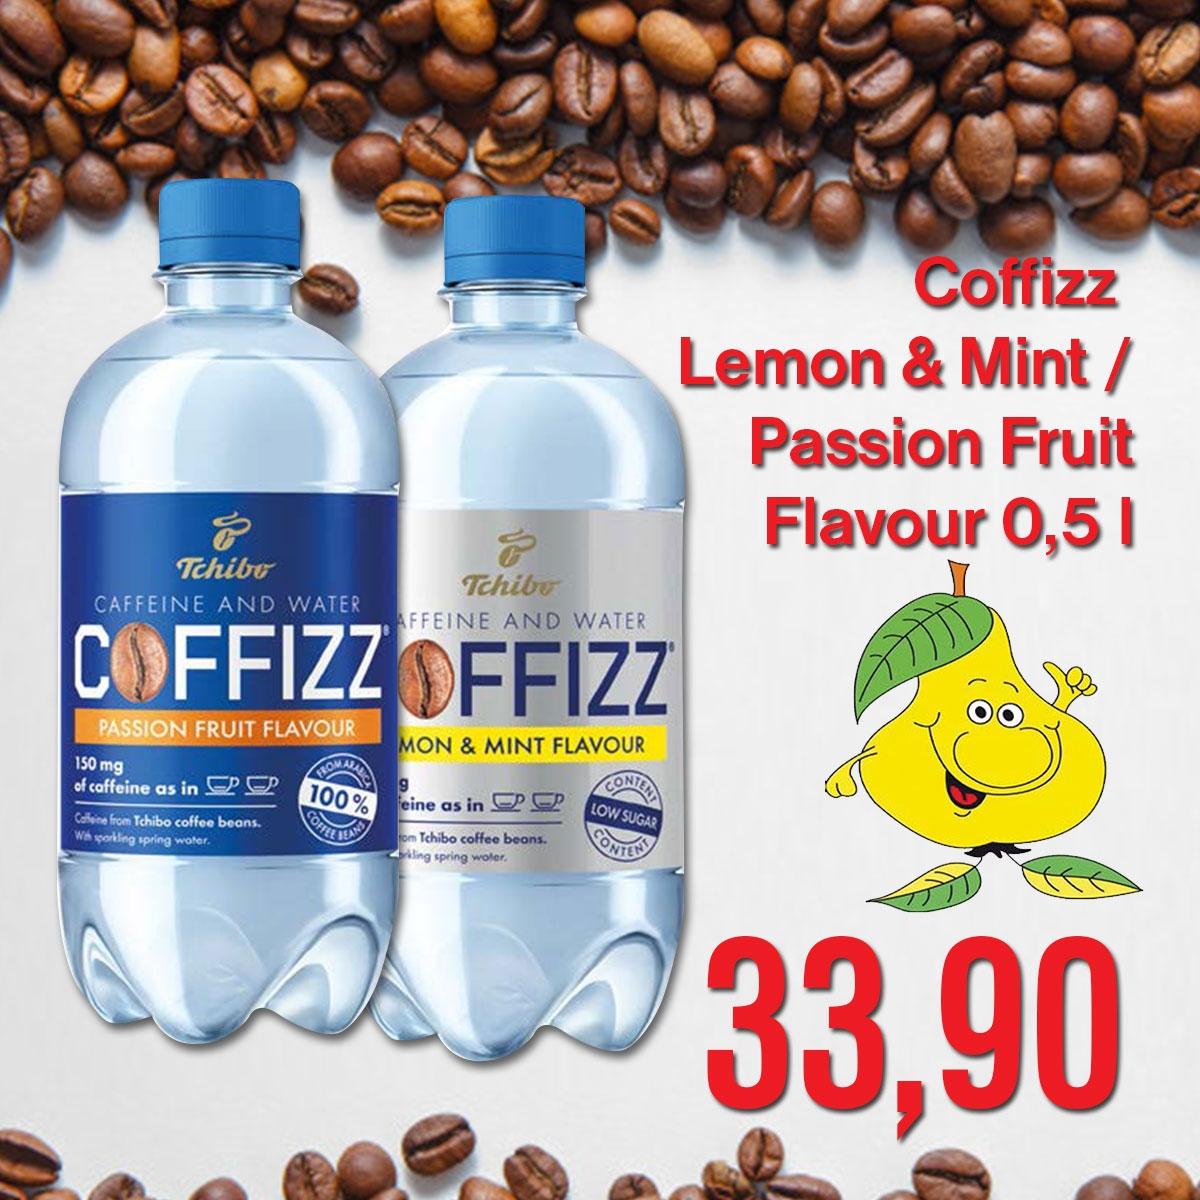 Coffizz 0,5l